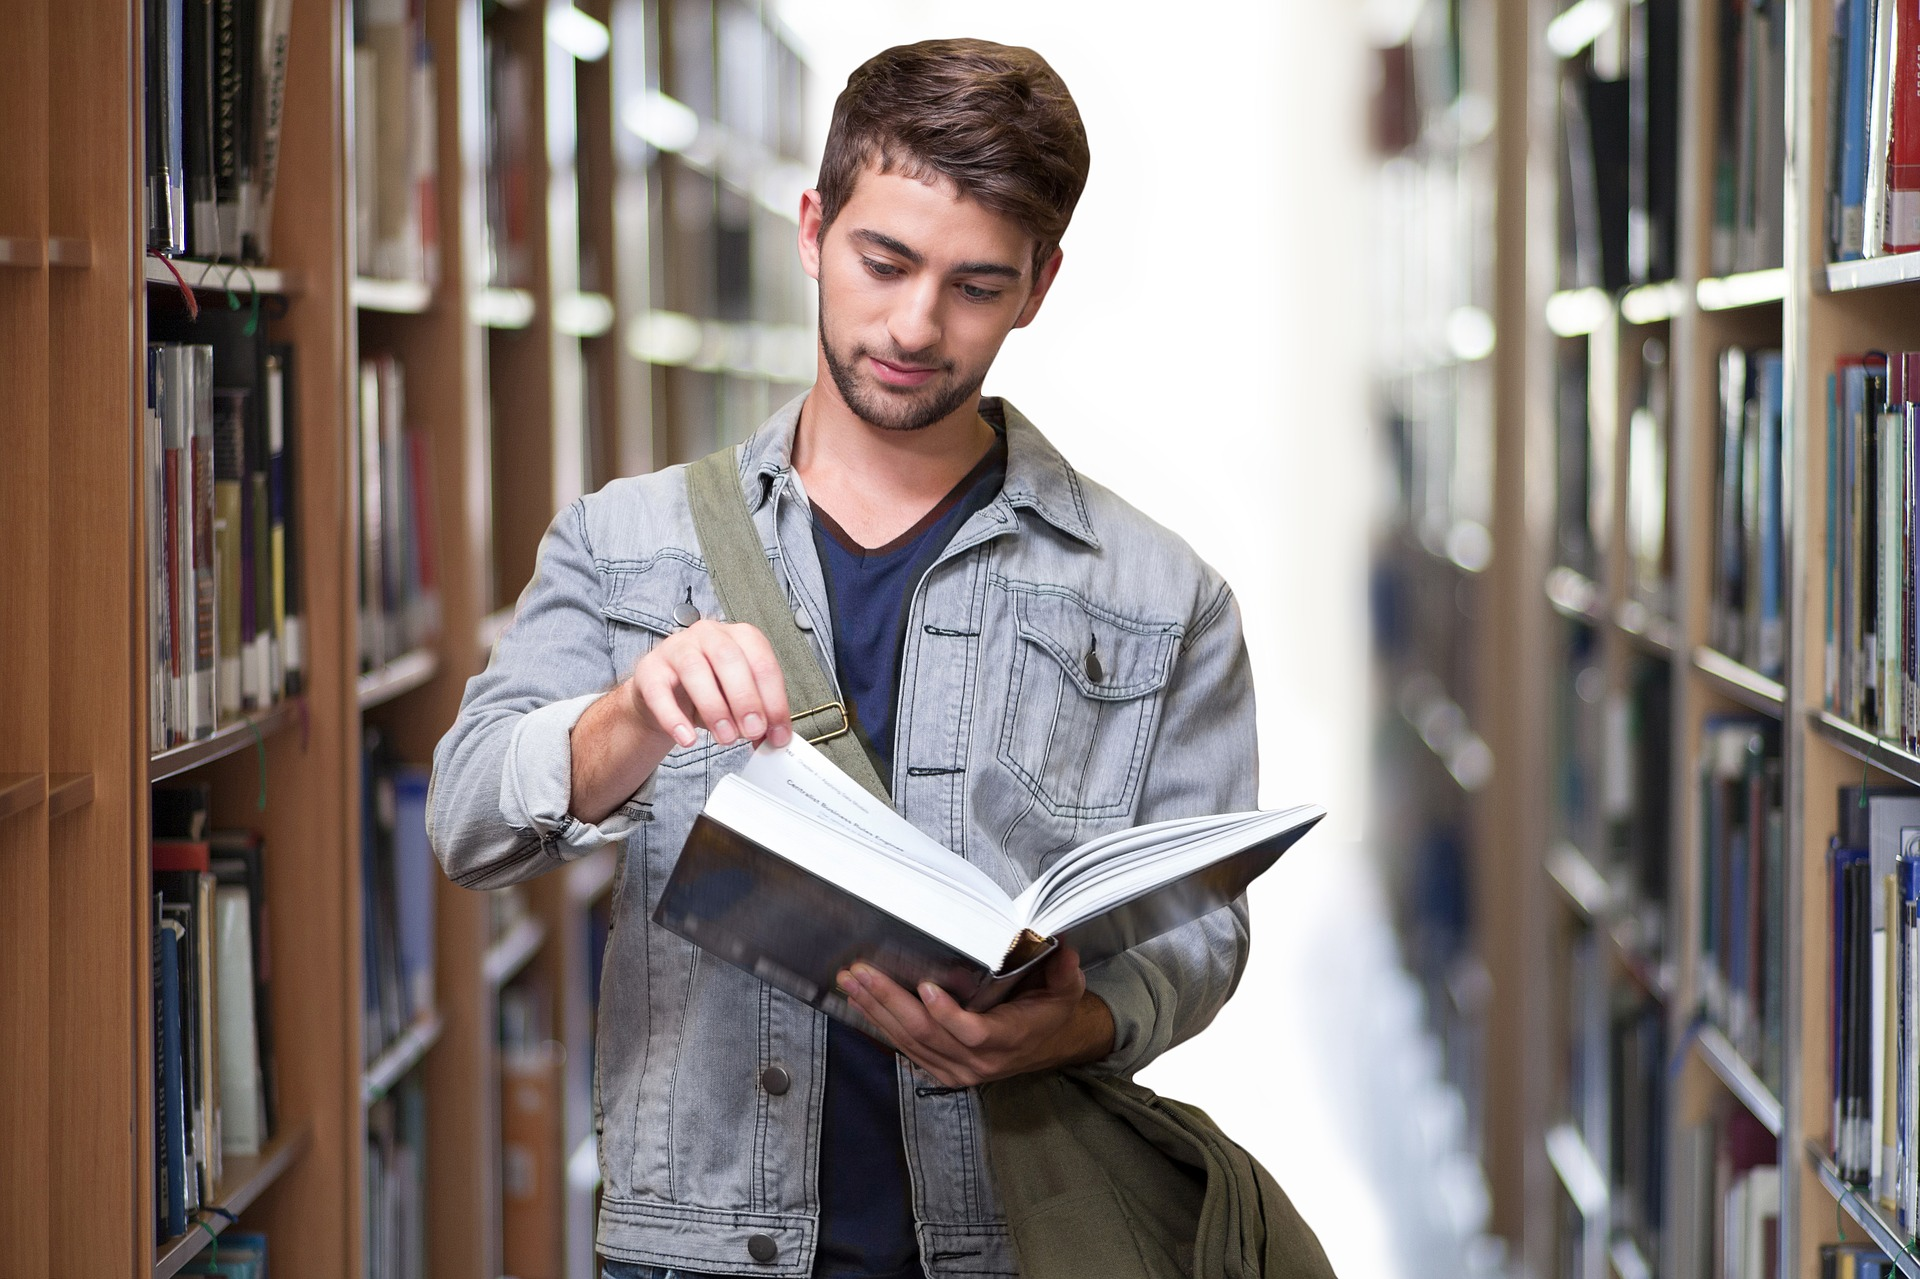 Student Visa Holder